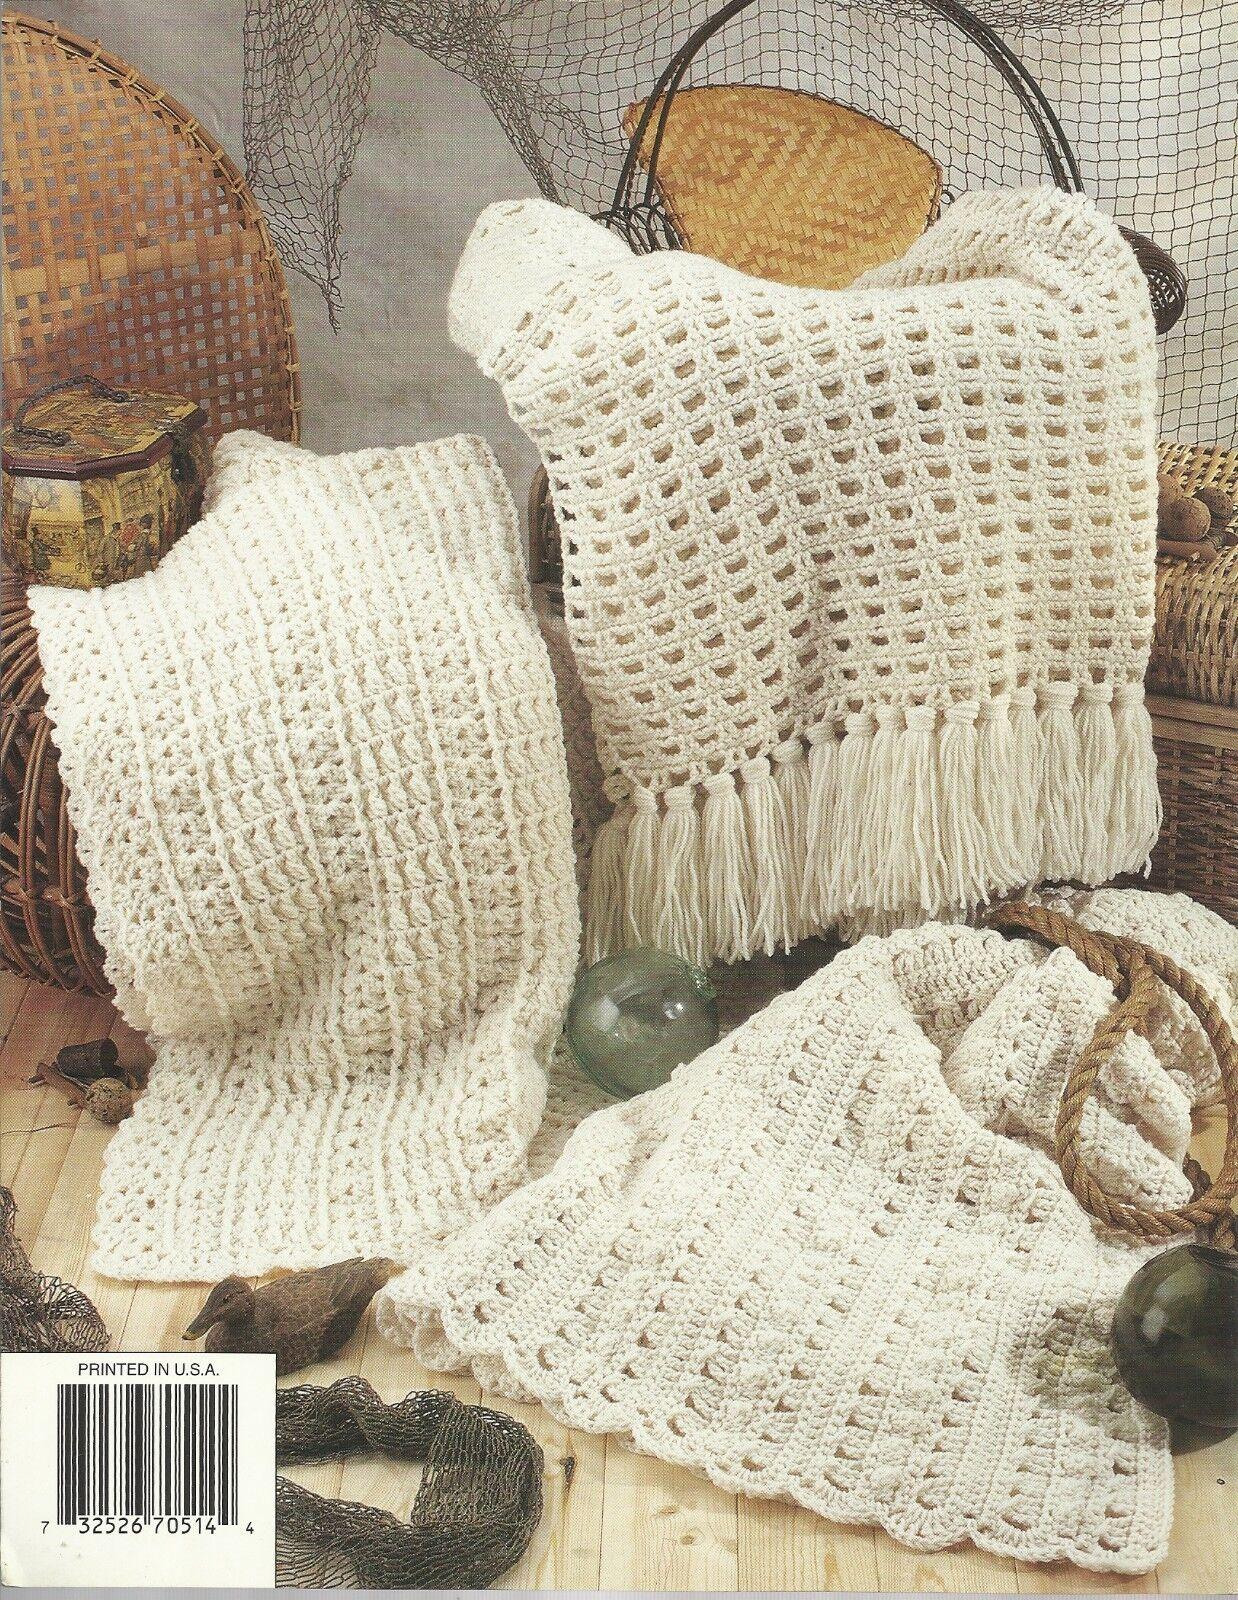 Aran Afghans 6 Crochet Patterns Annie\'s Attic 870514 | eBay